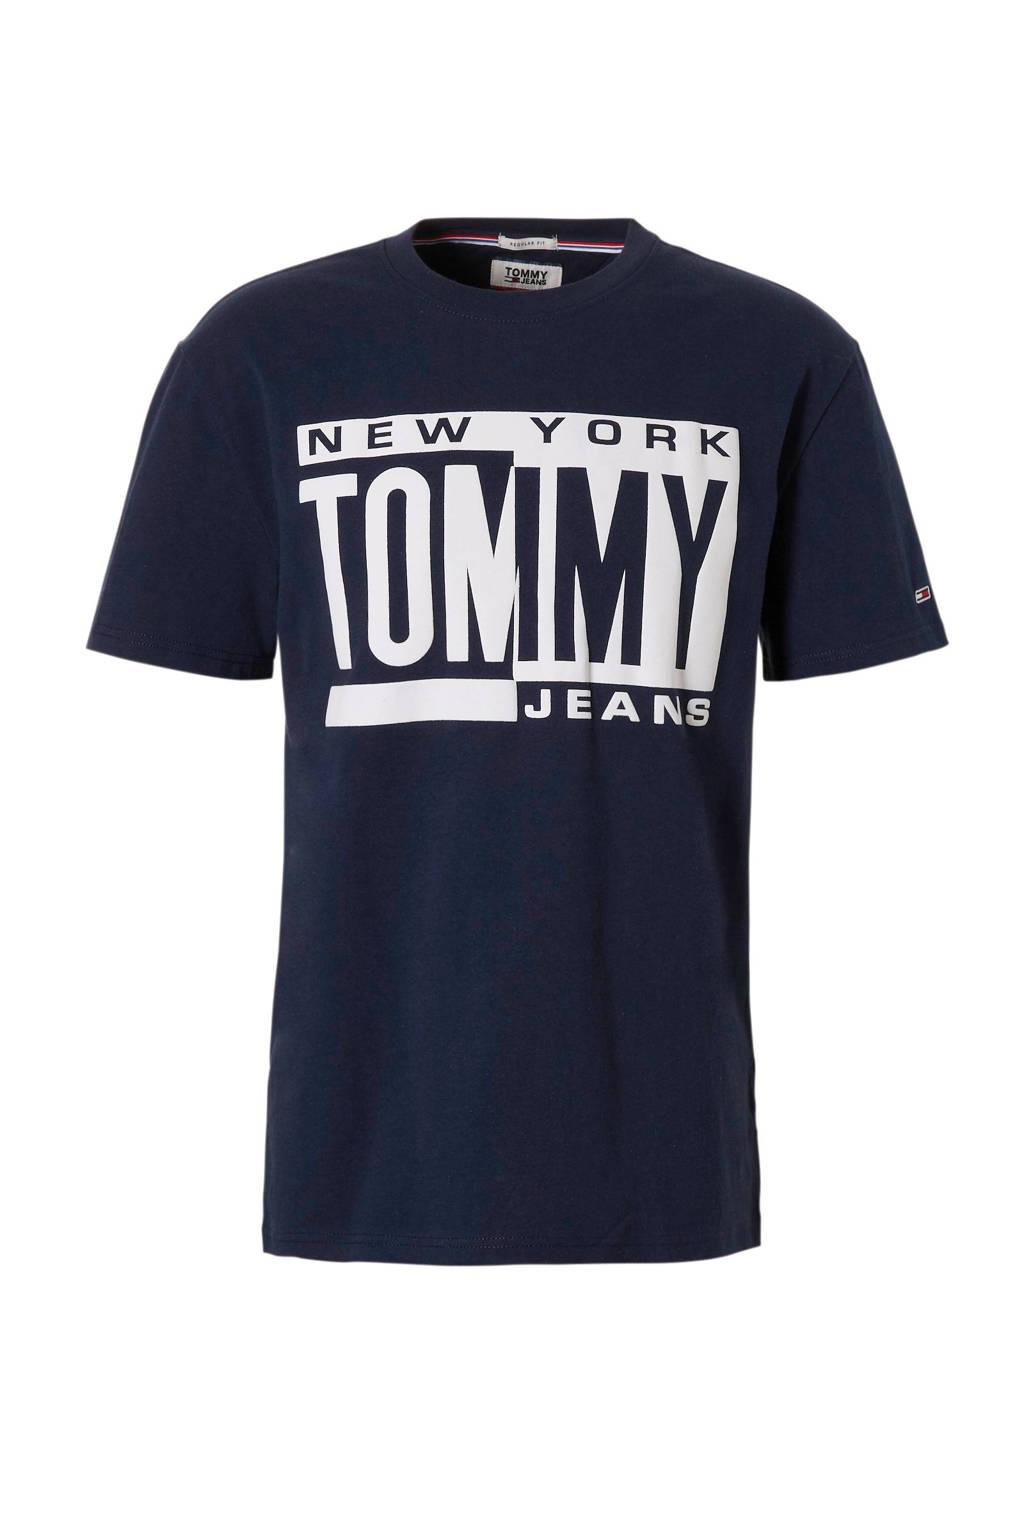 Tommy Jeans T-shirt met logo marine, Marine